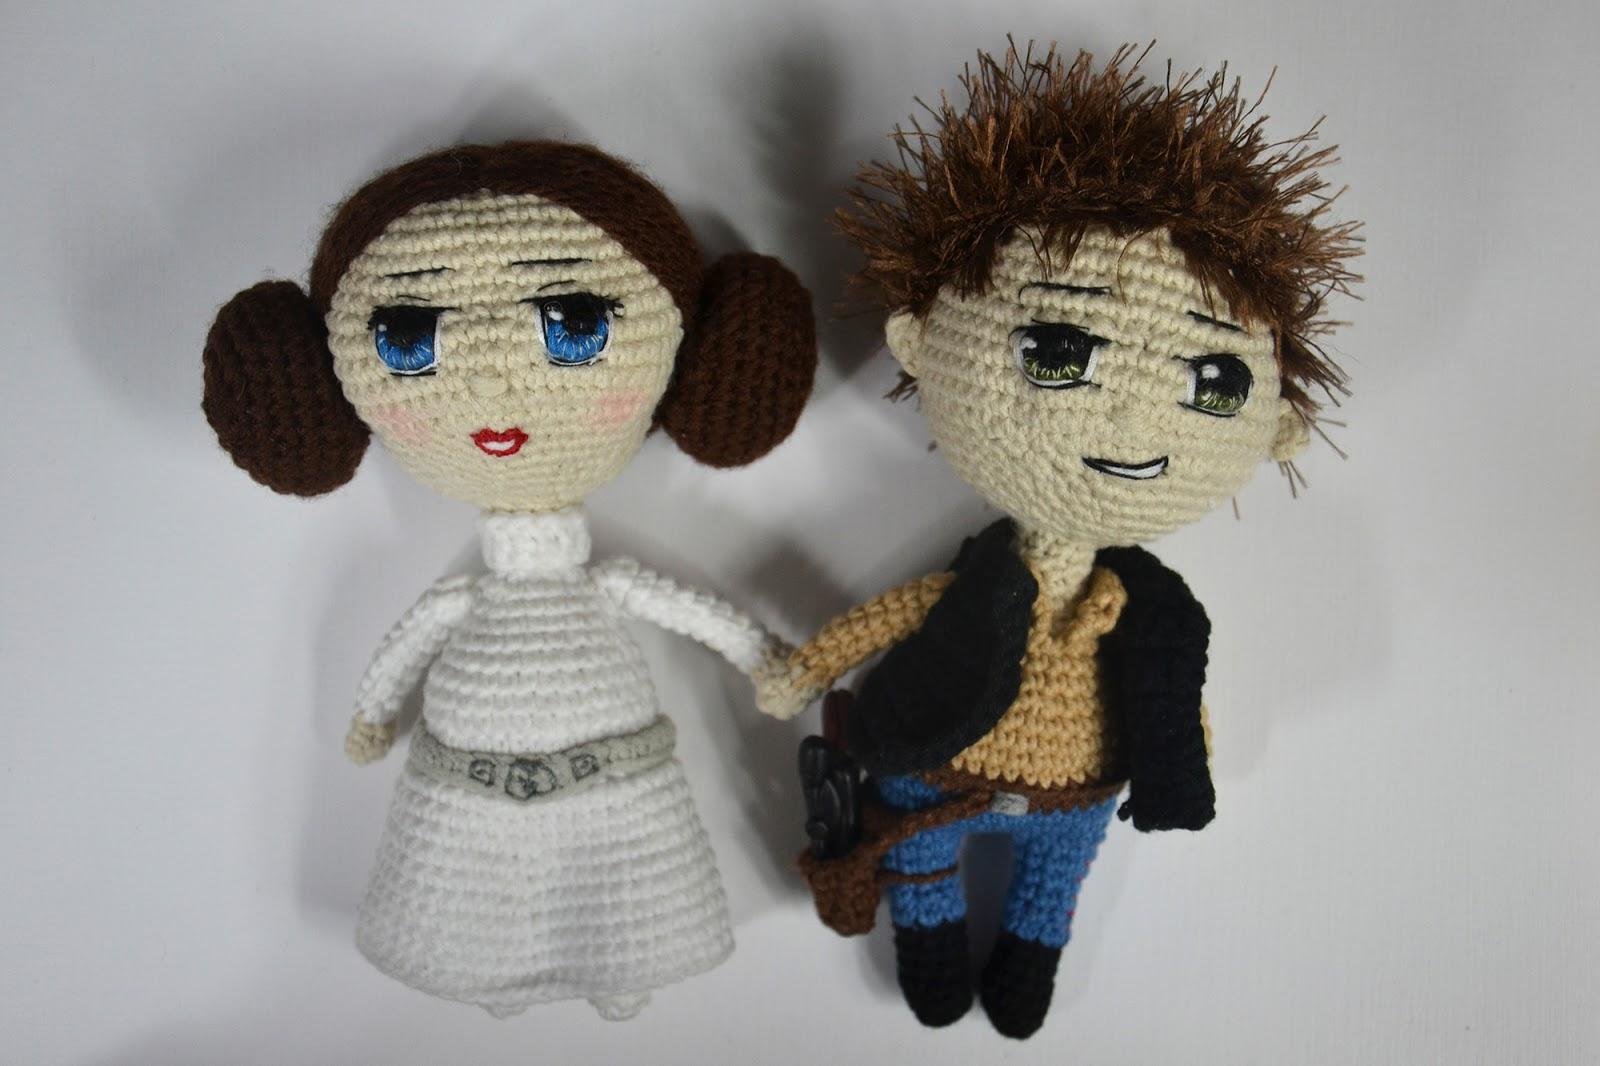 Malvin the amirugumi mouse - A free crochet pattern - Yarnhild.com | 1066x1600